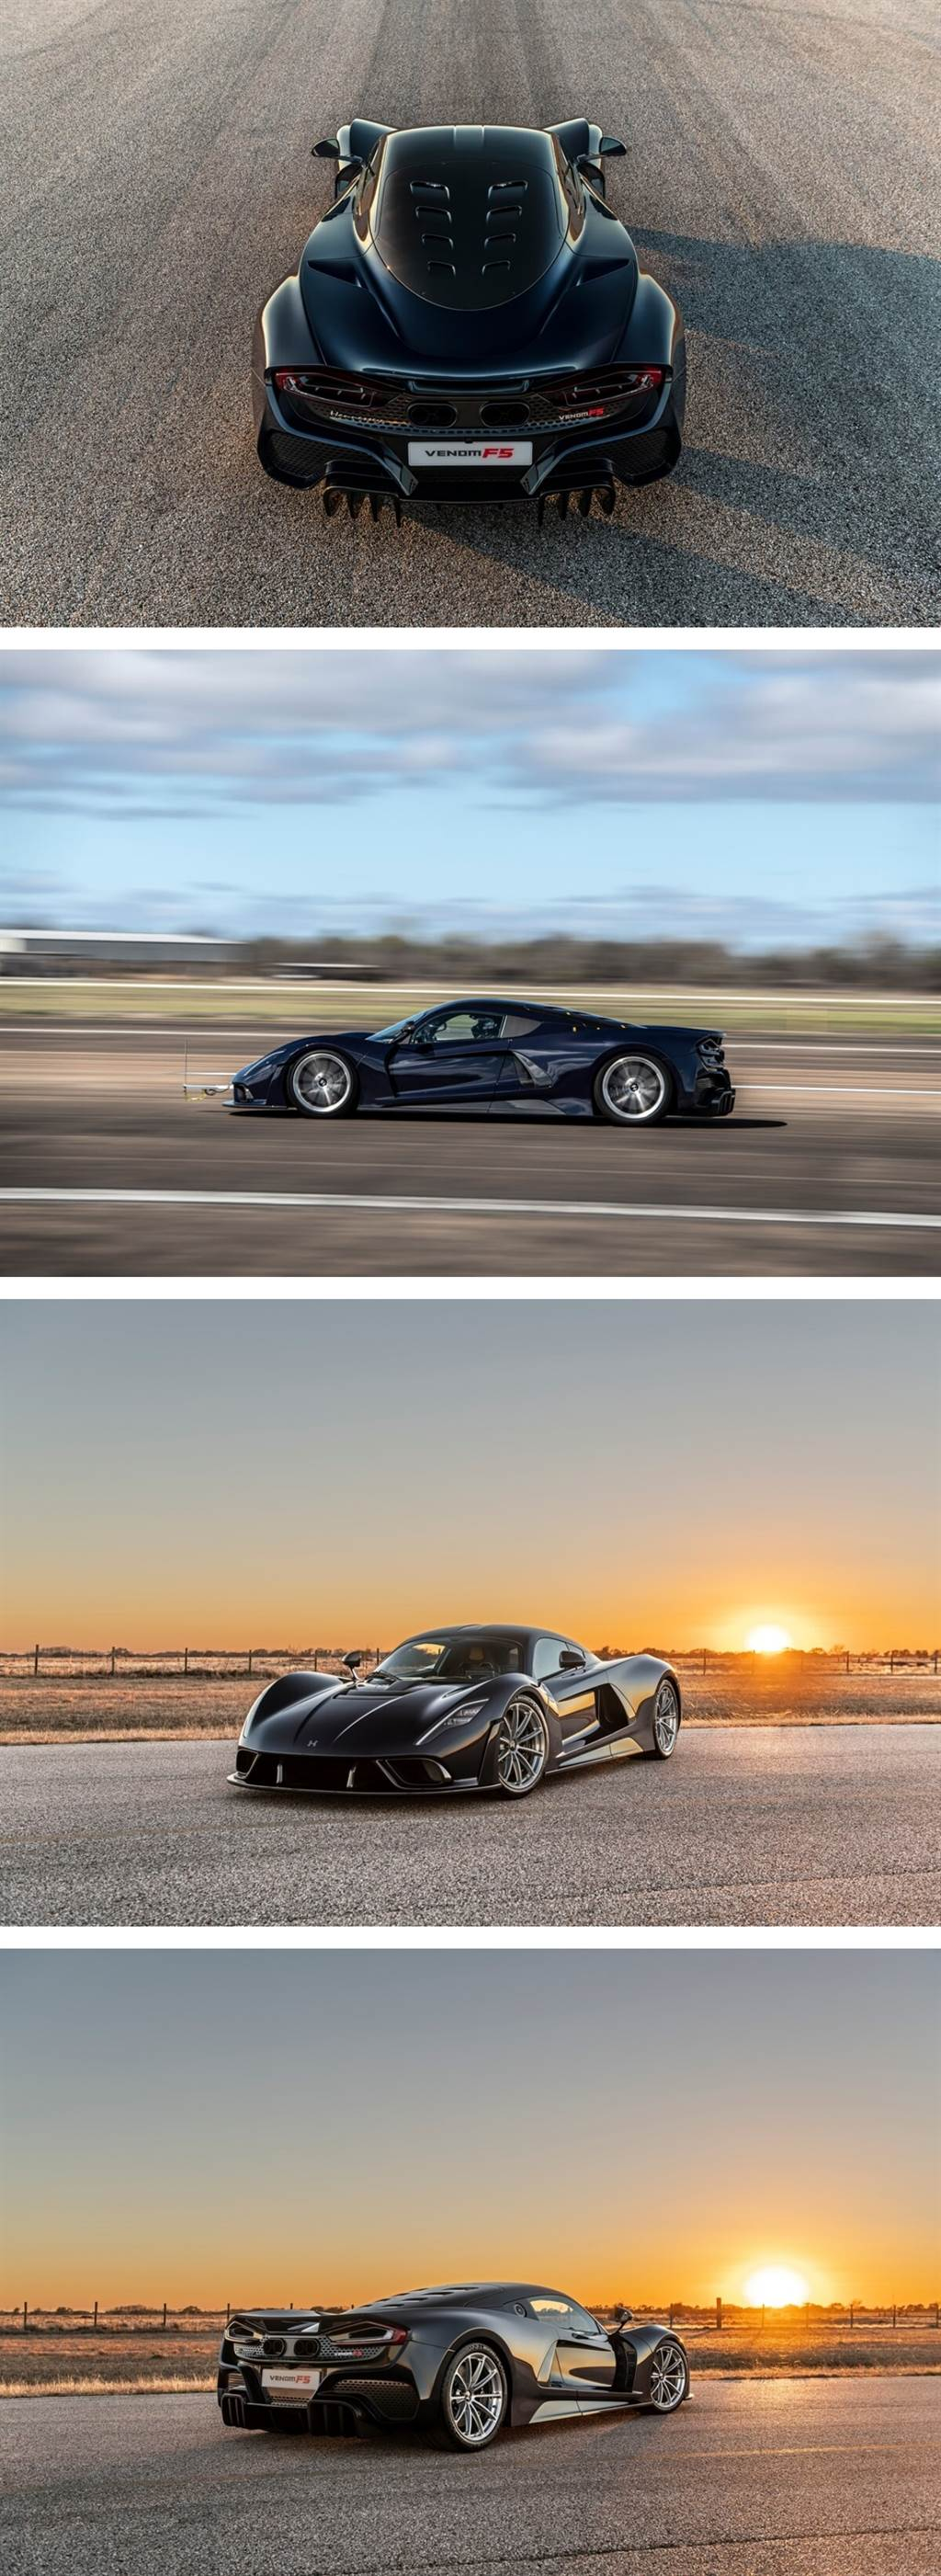 Hennessey完成Venom F5第一輪空氣力學測試,終極目標極速:500 km/h!